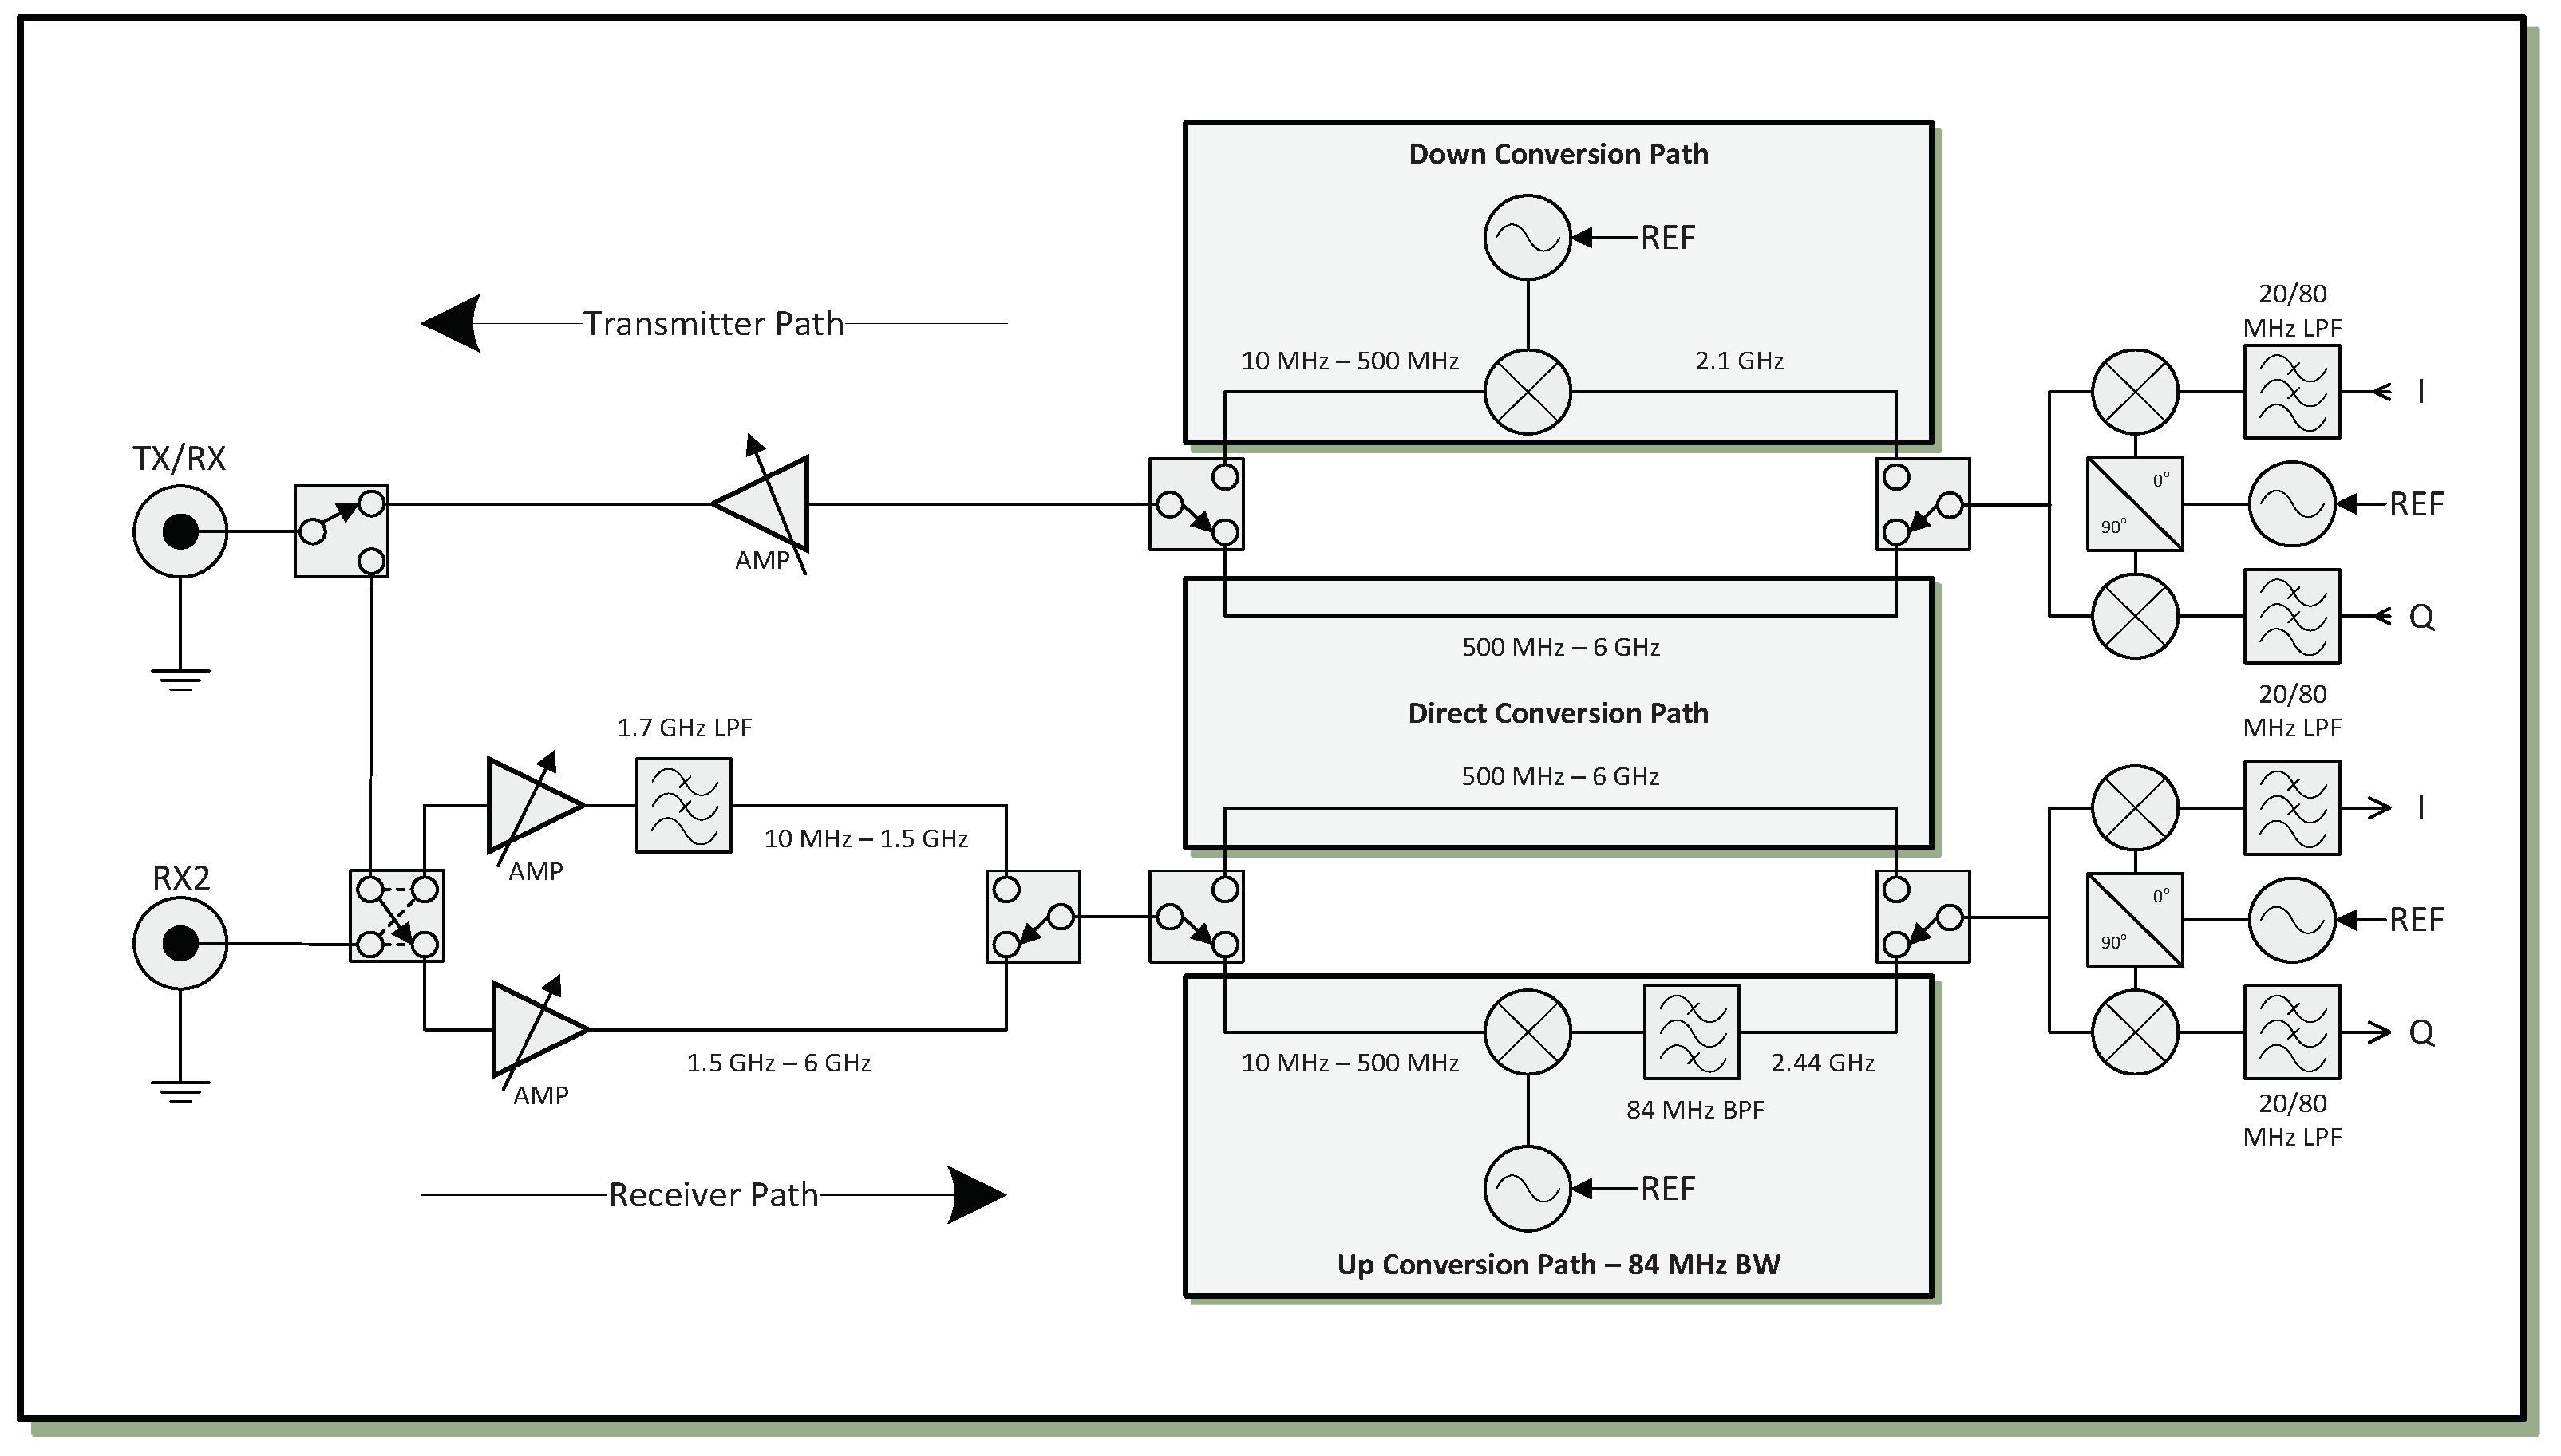 UBX 10 MHz - 6 GHz Rx/Tx, 160 MHz BW - Ettus Research